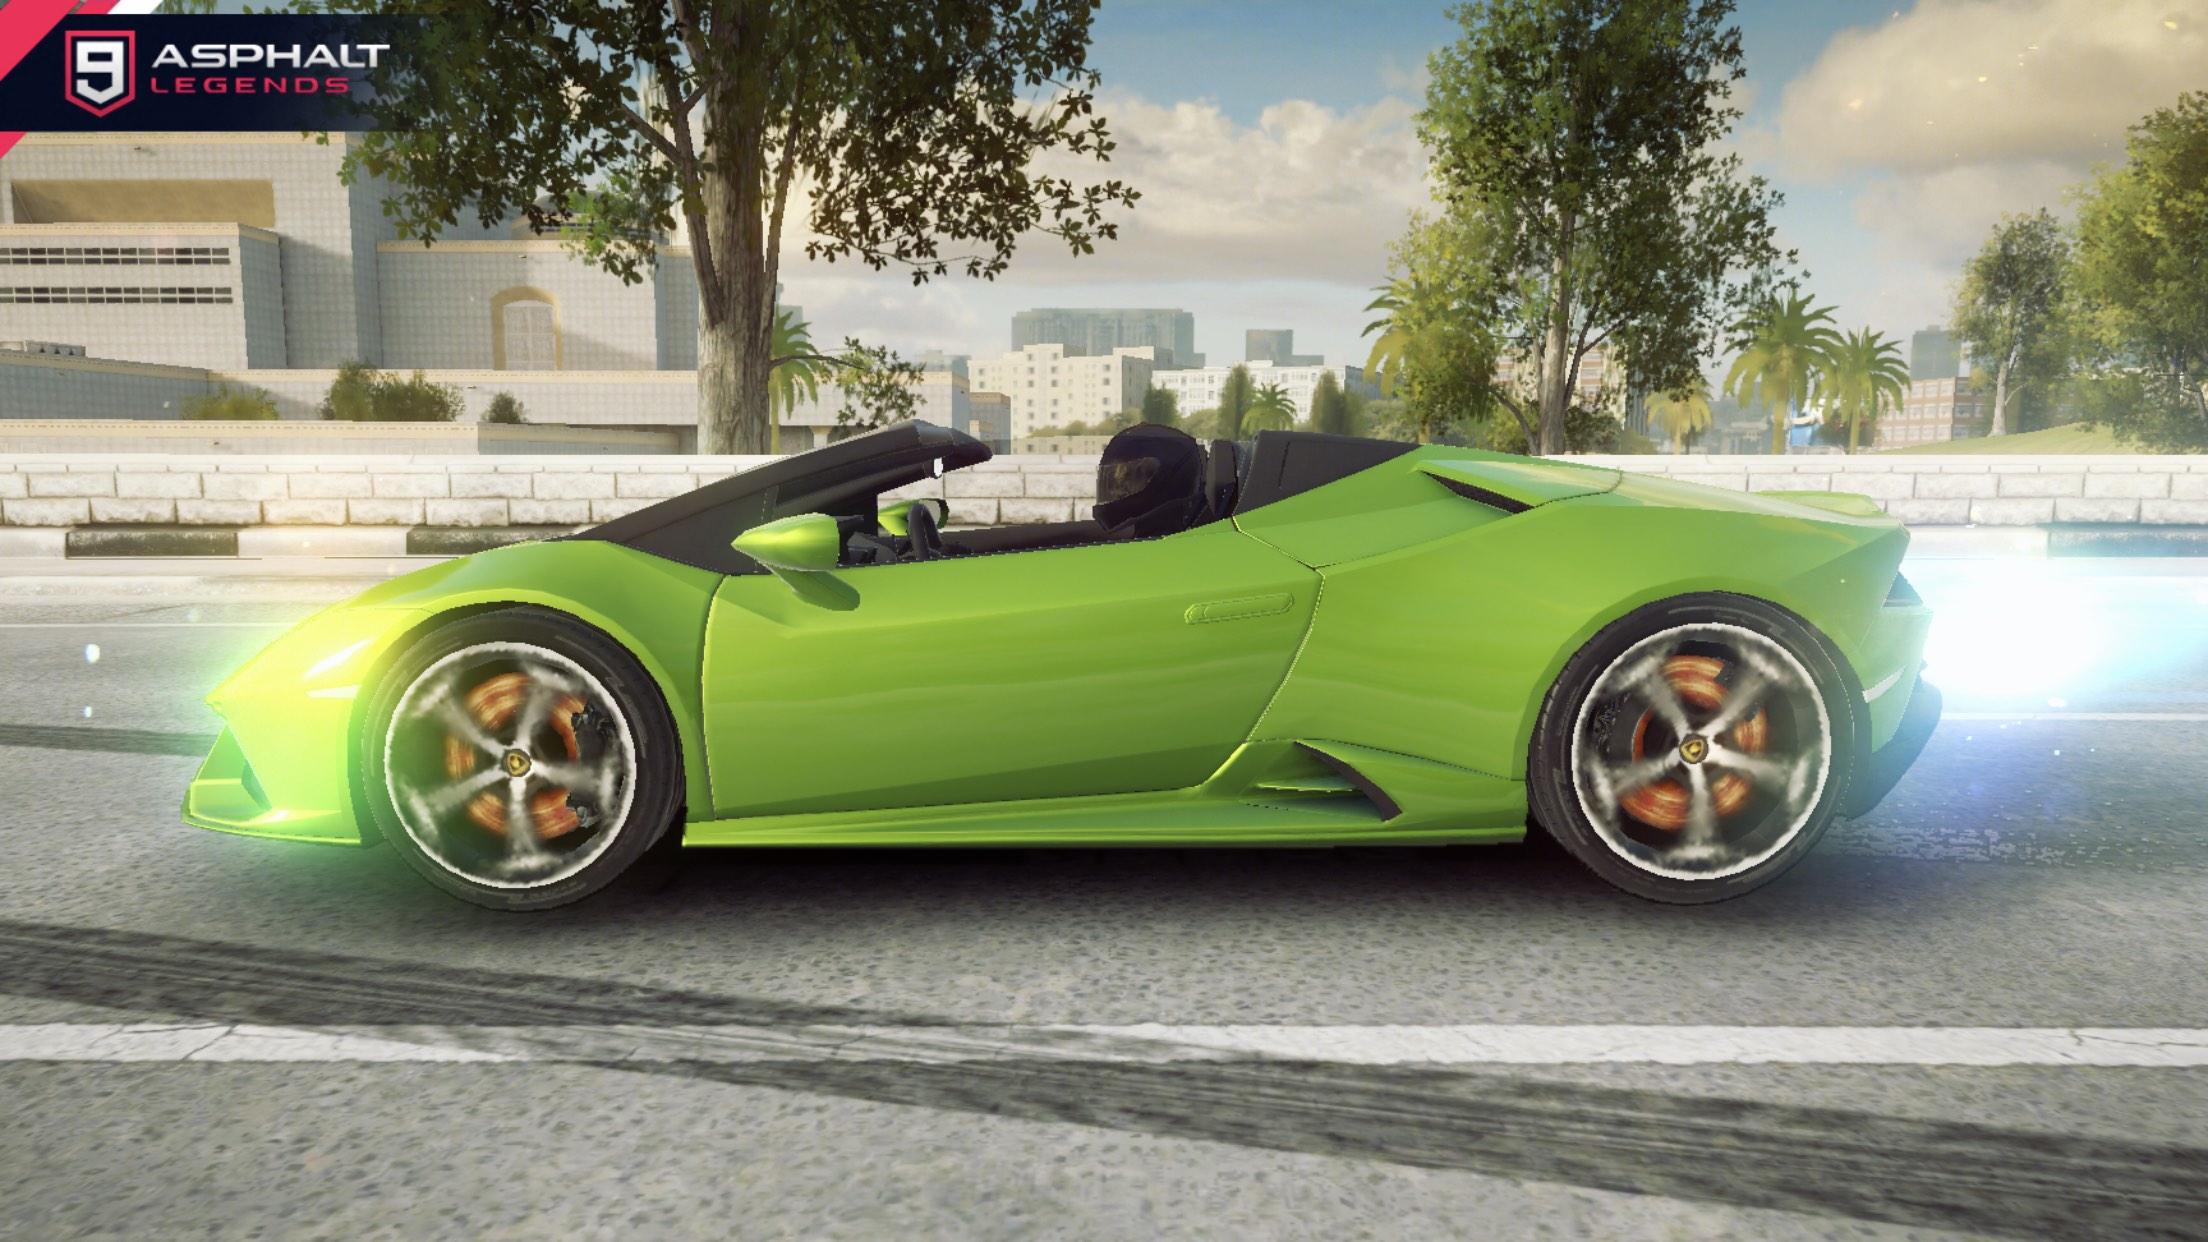 Lamborghini Huracan Evo Spyder Asphalt 9 Legends Database Test